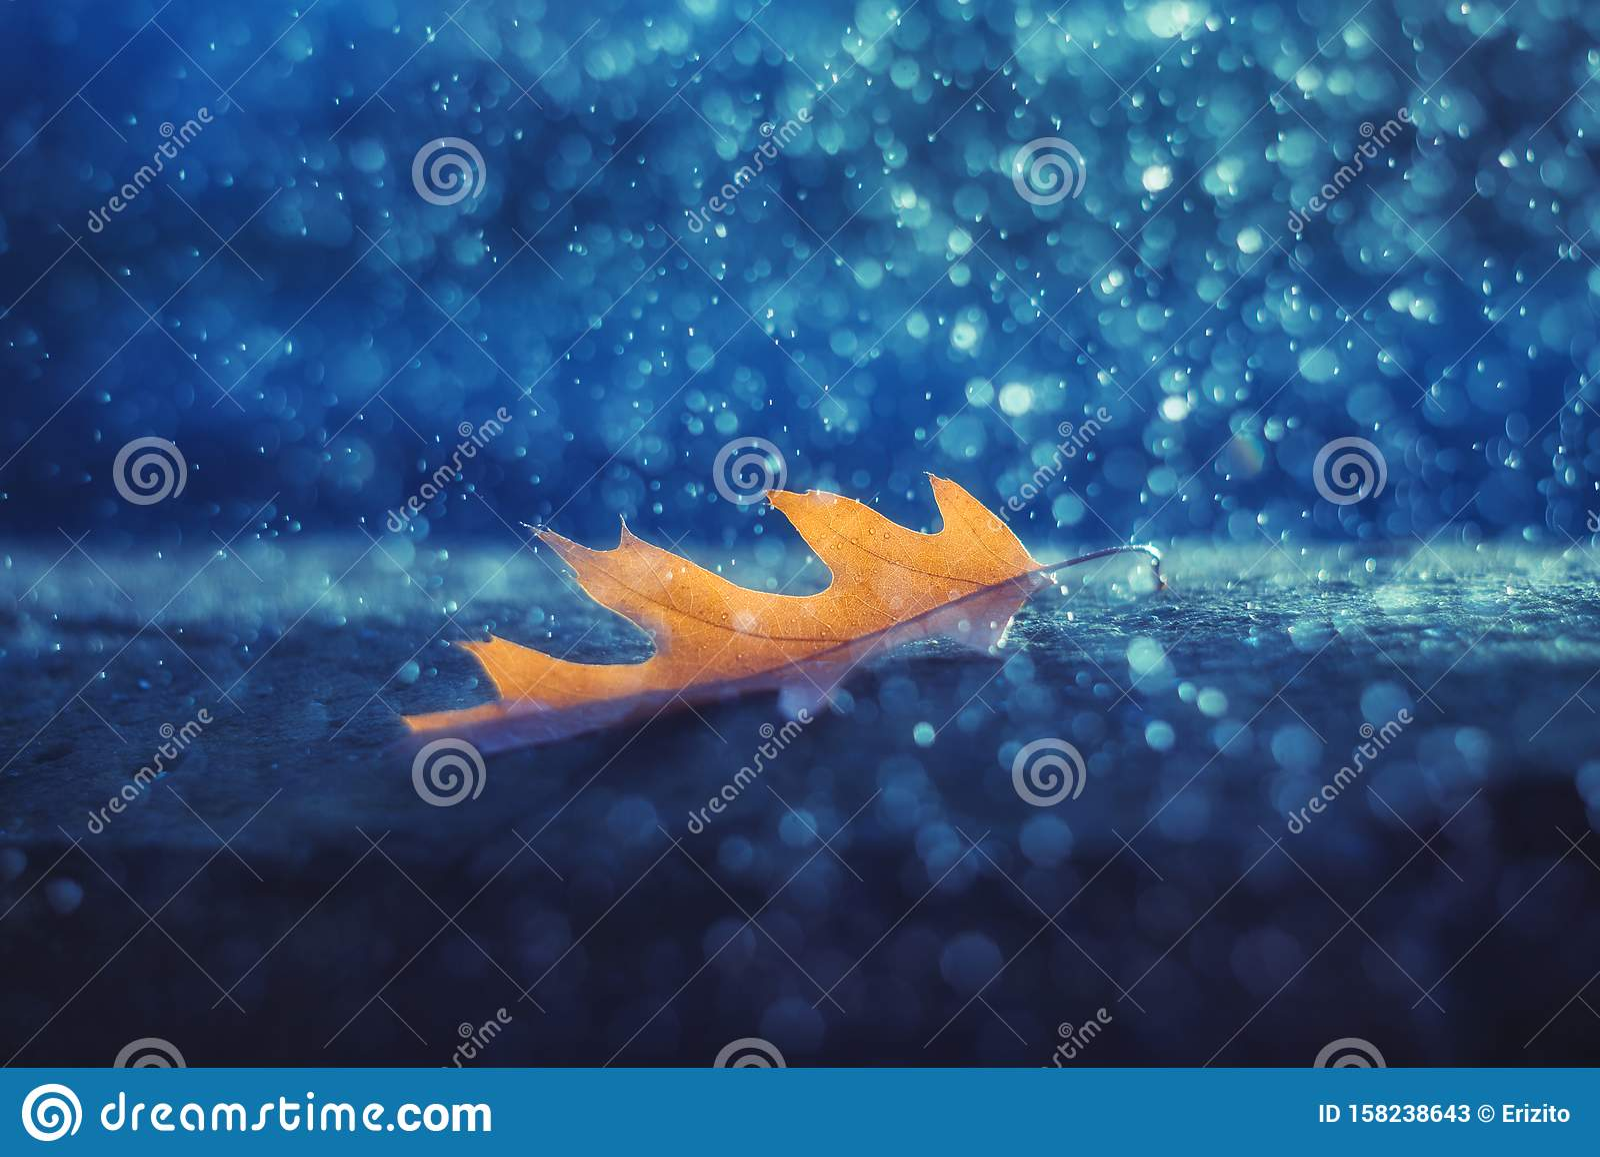 Magic autumn blue background with yellow oak leaf